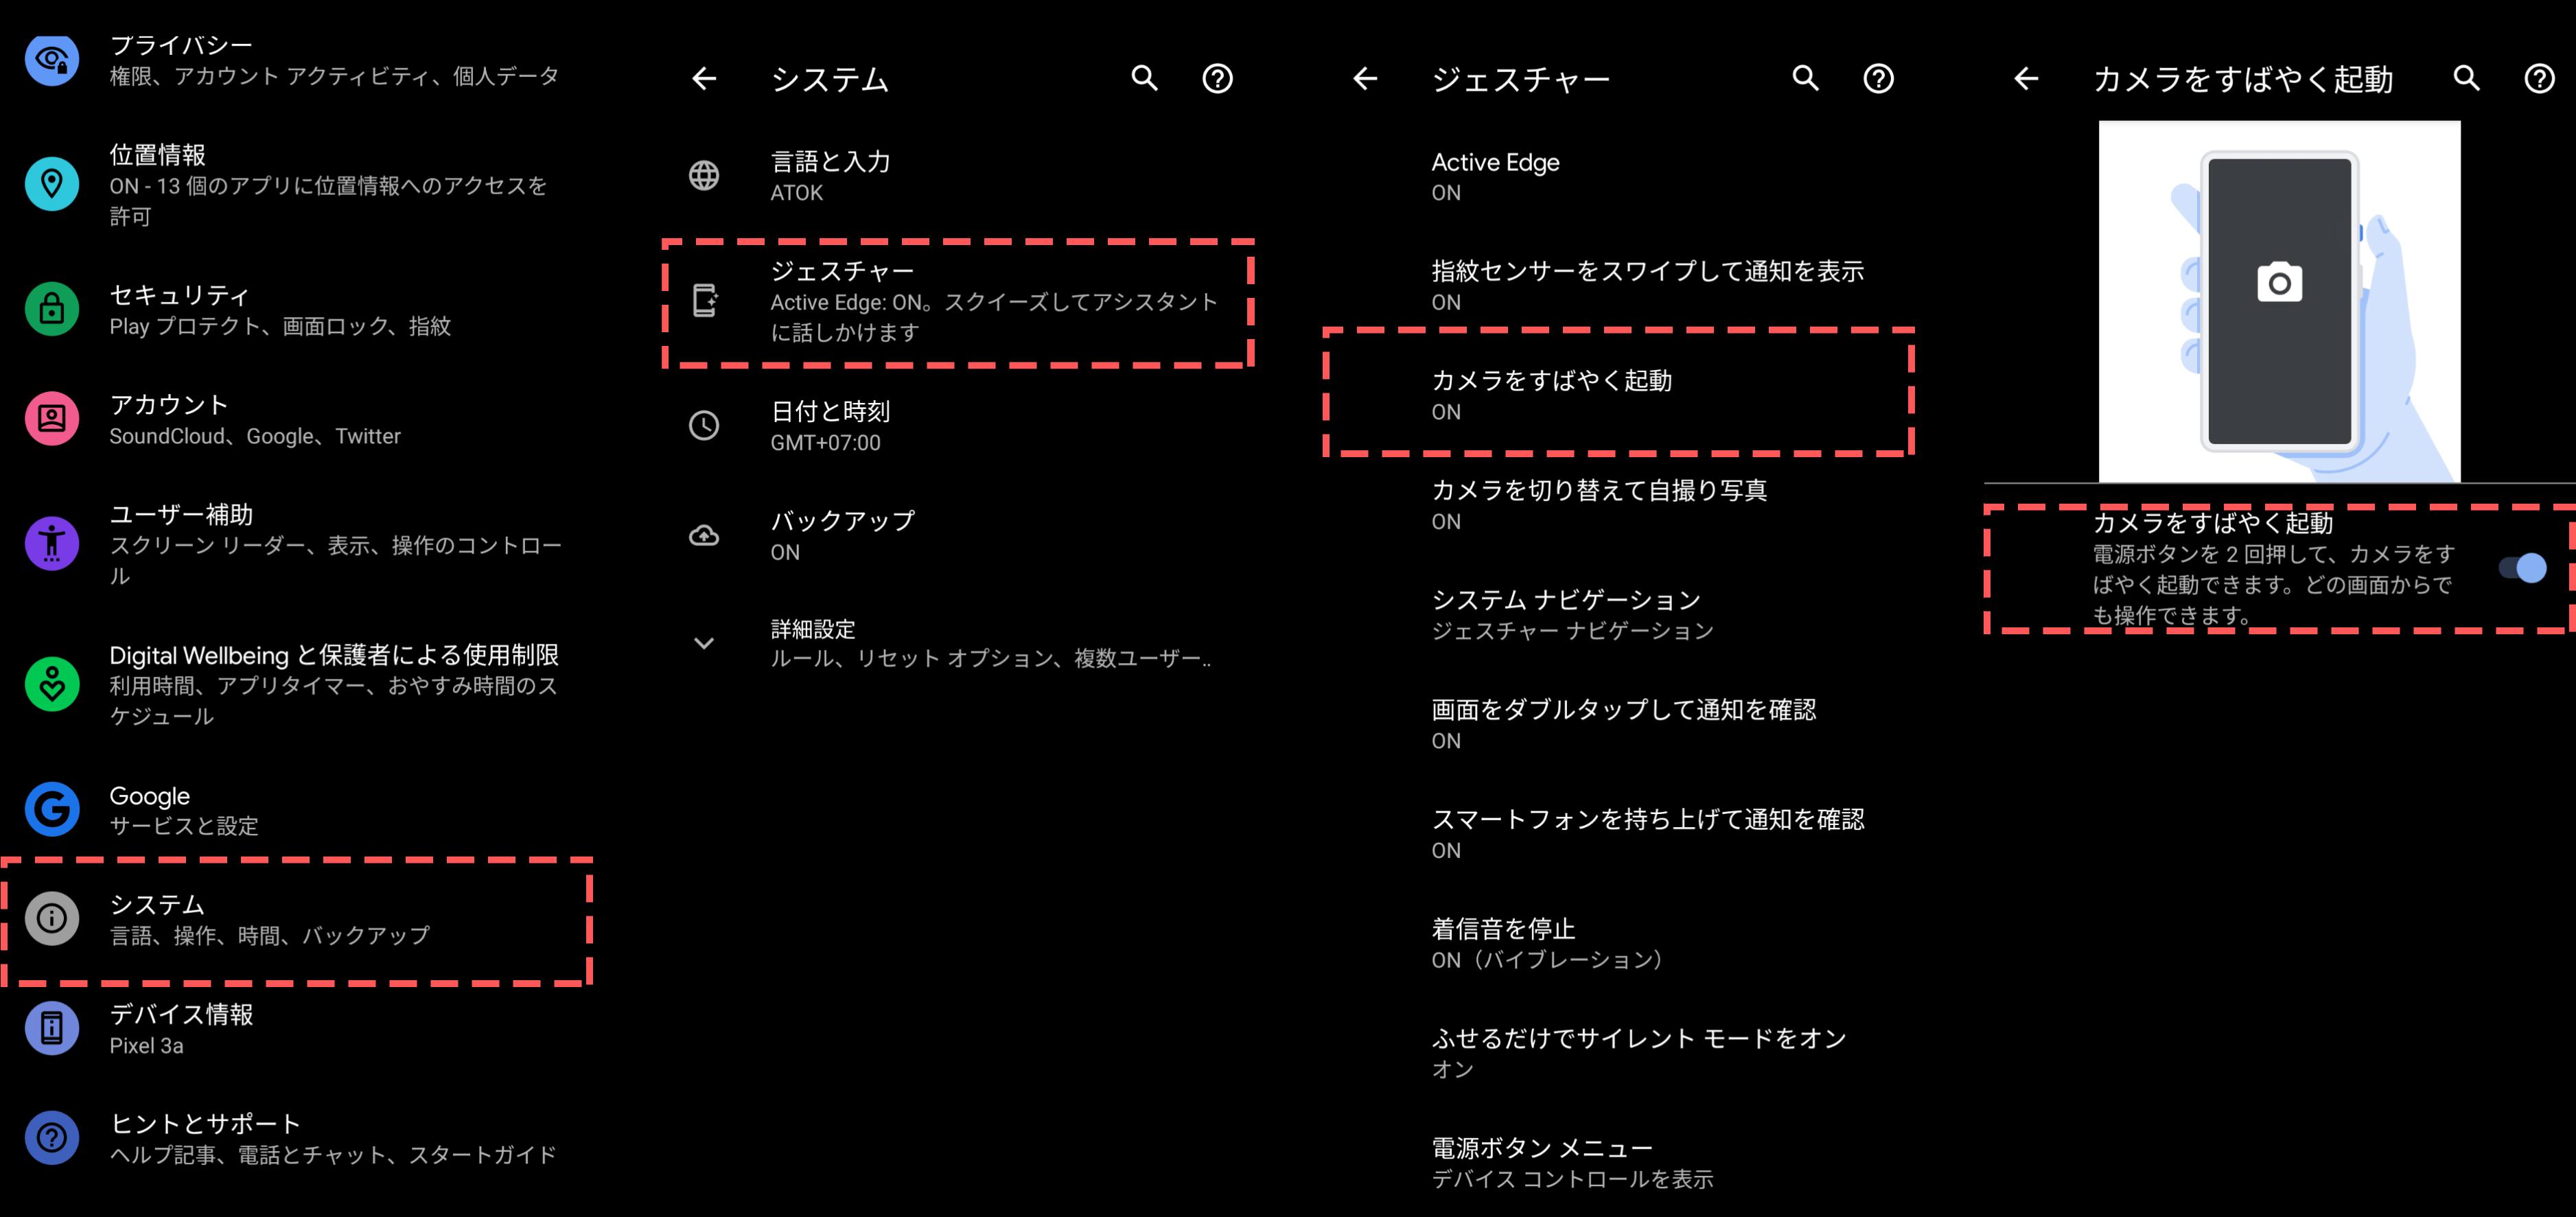 Google Pixel:システム設定画面